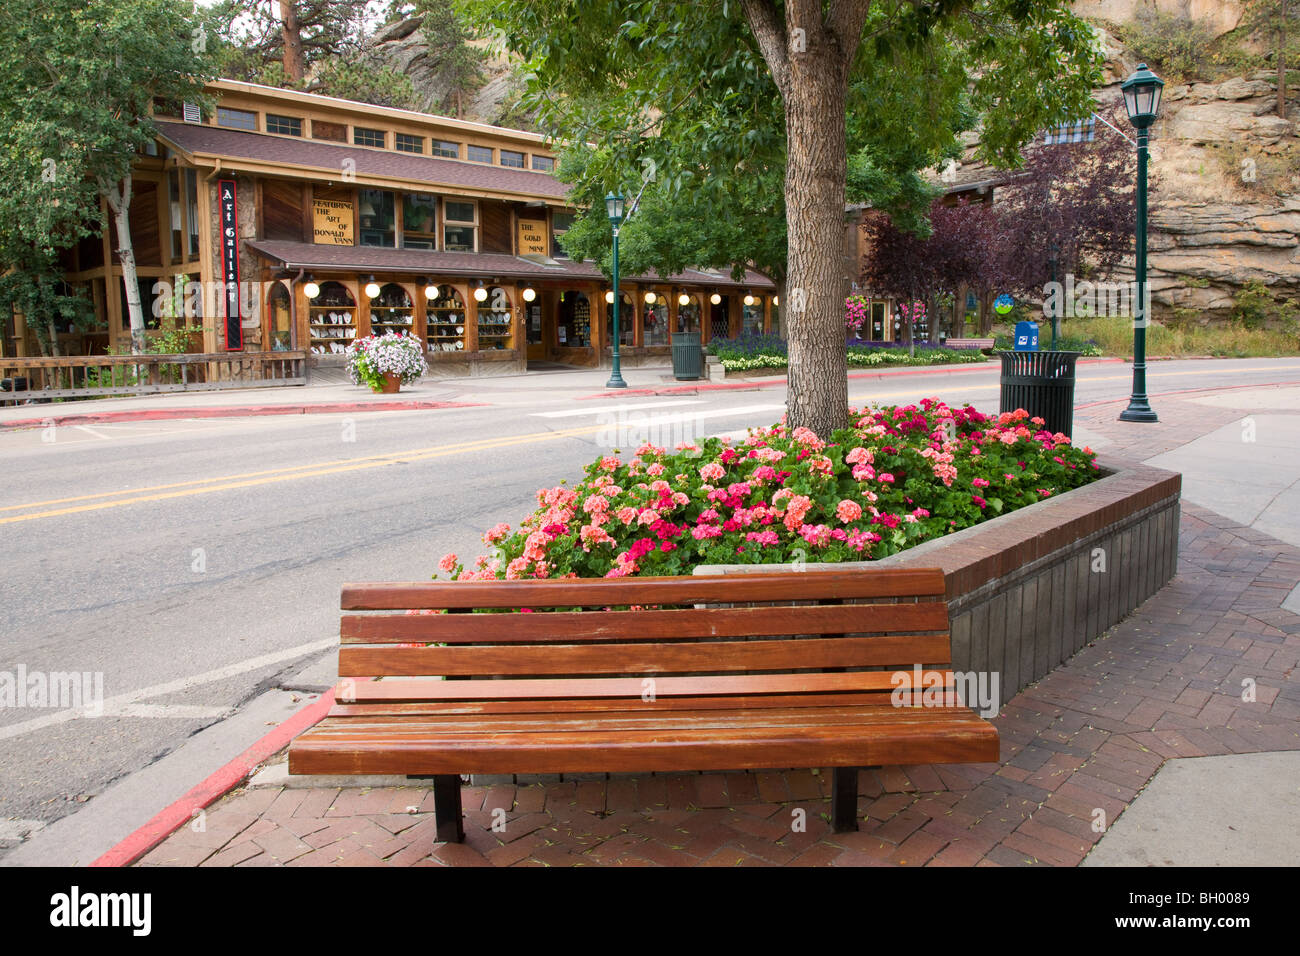 Estes Park, gateway to Rocky Mountain National Park, Colorado. - Stock Image